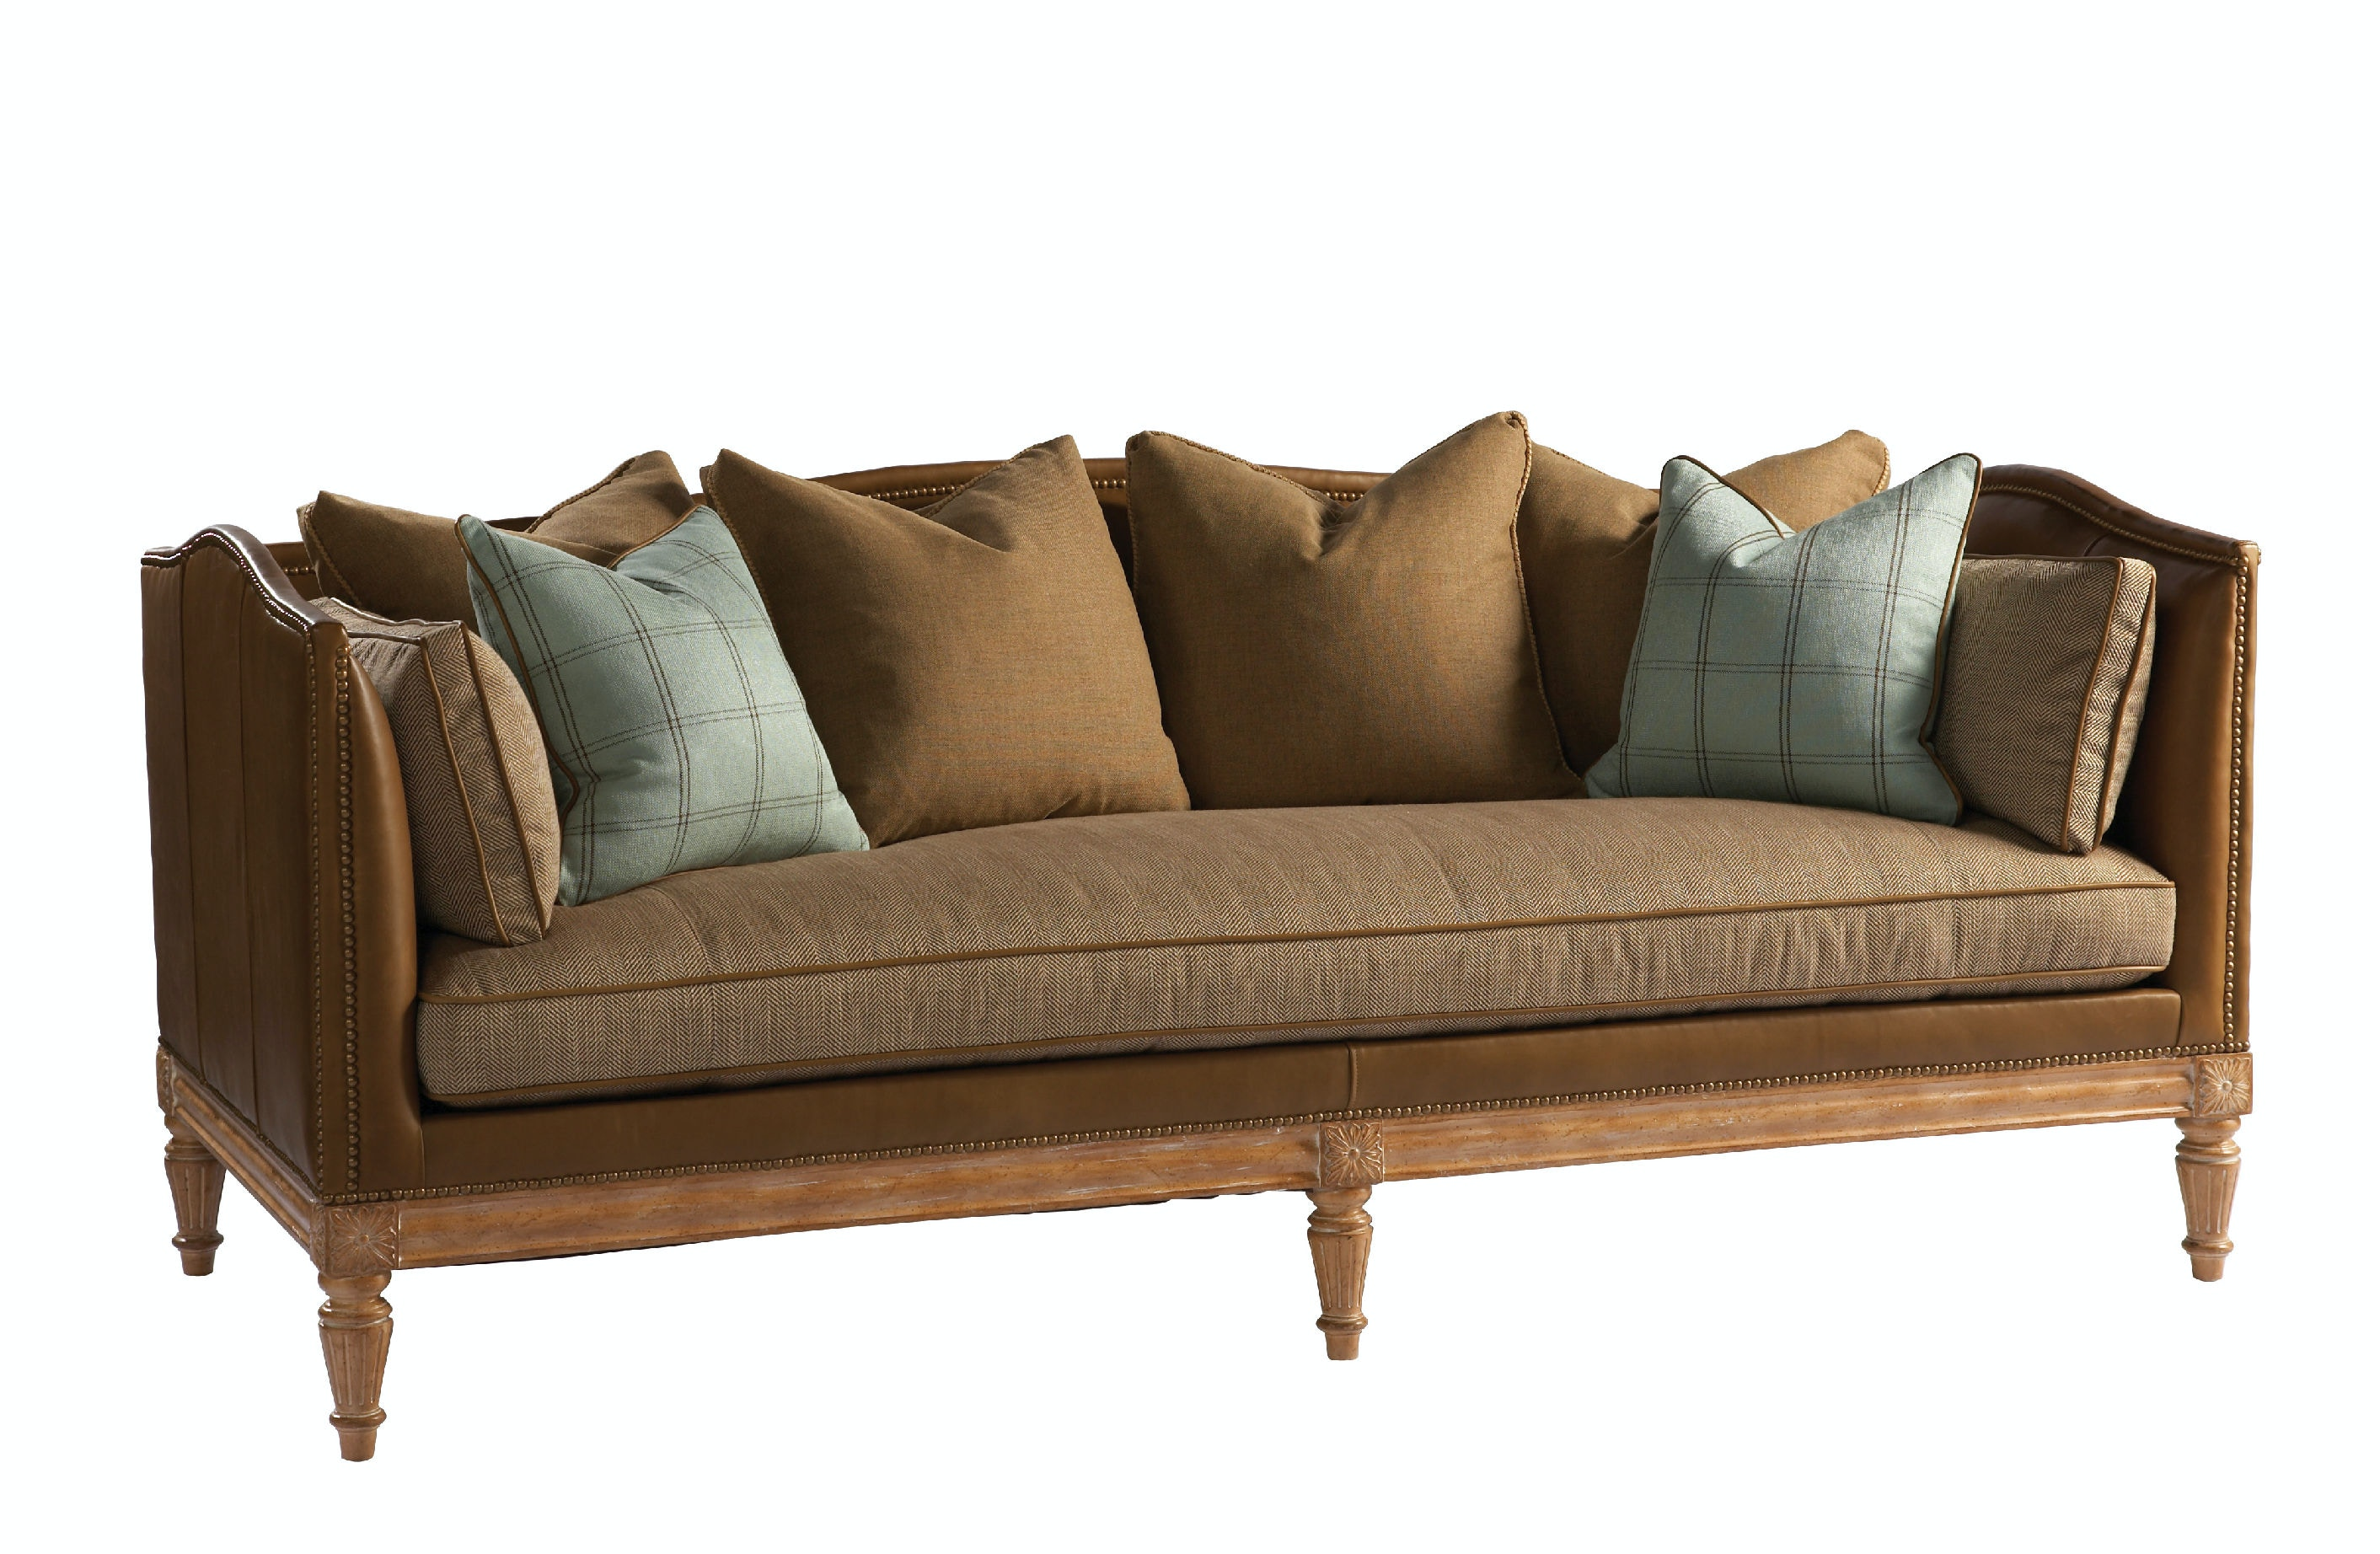 LL2034S. Belvedere Sofa. LL2034S. Lillian August ...